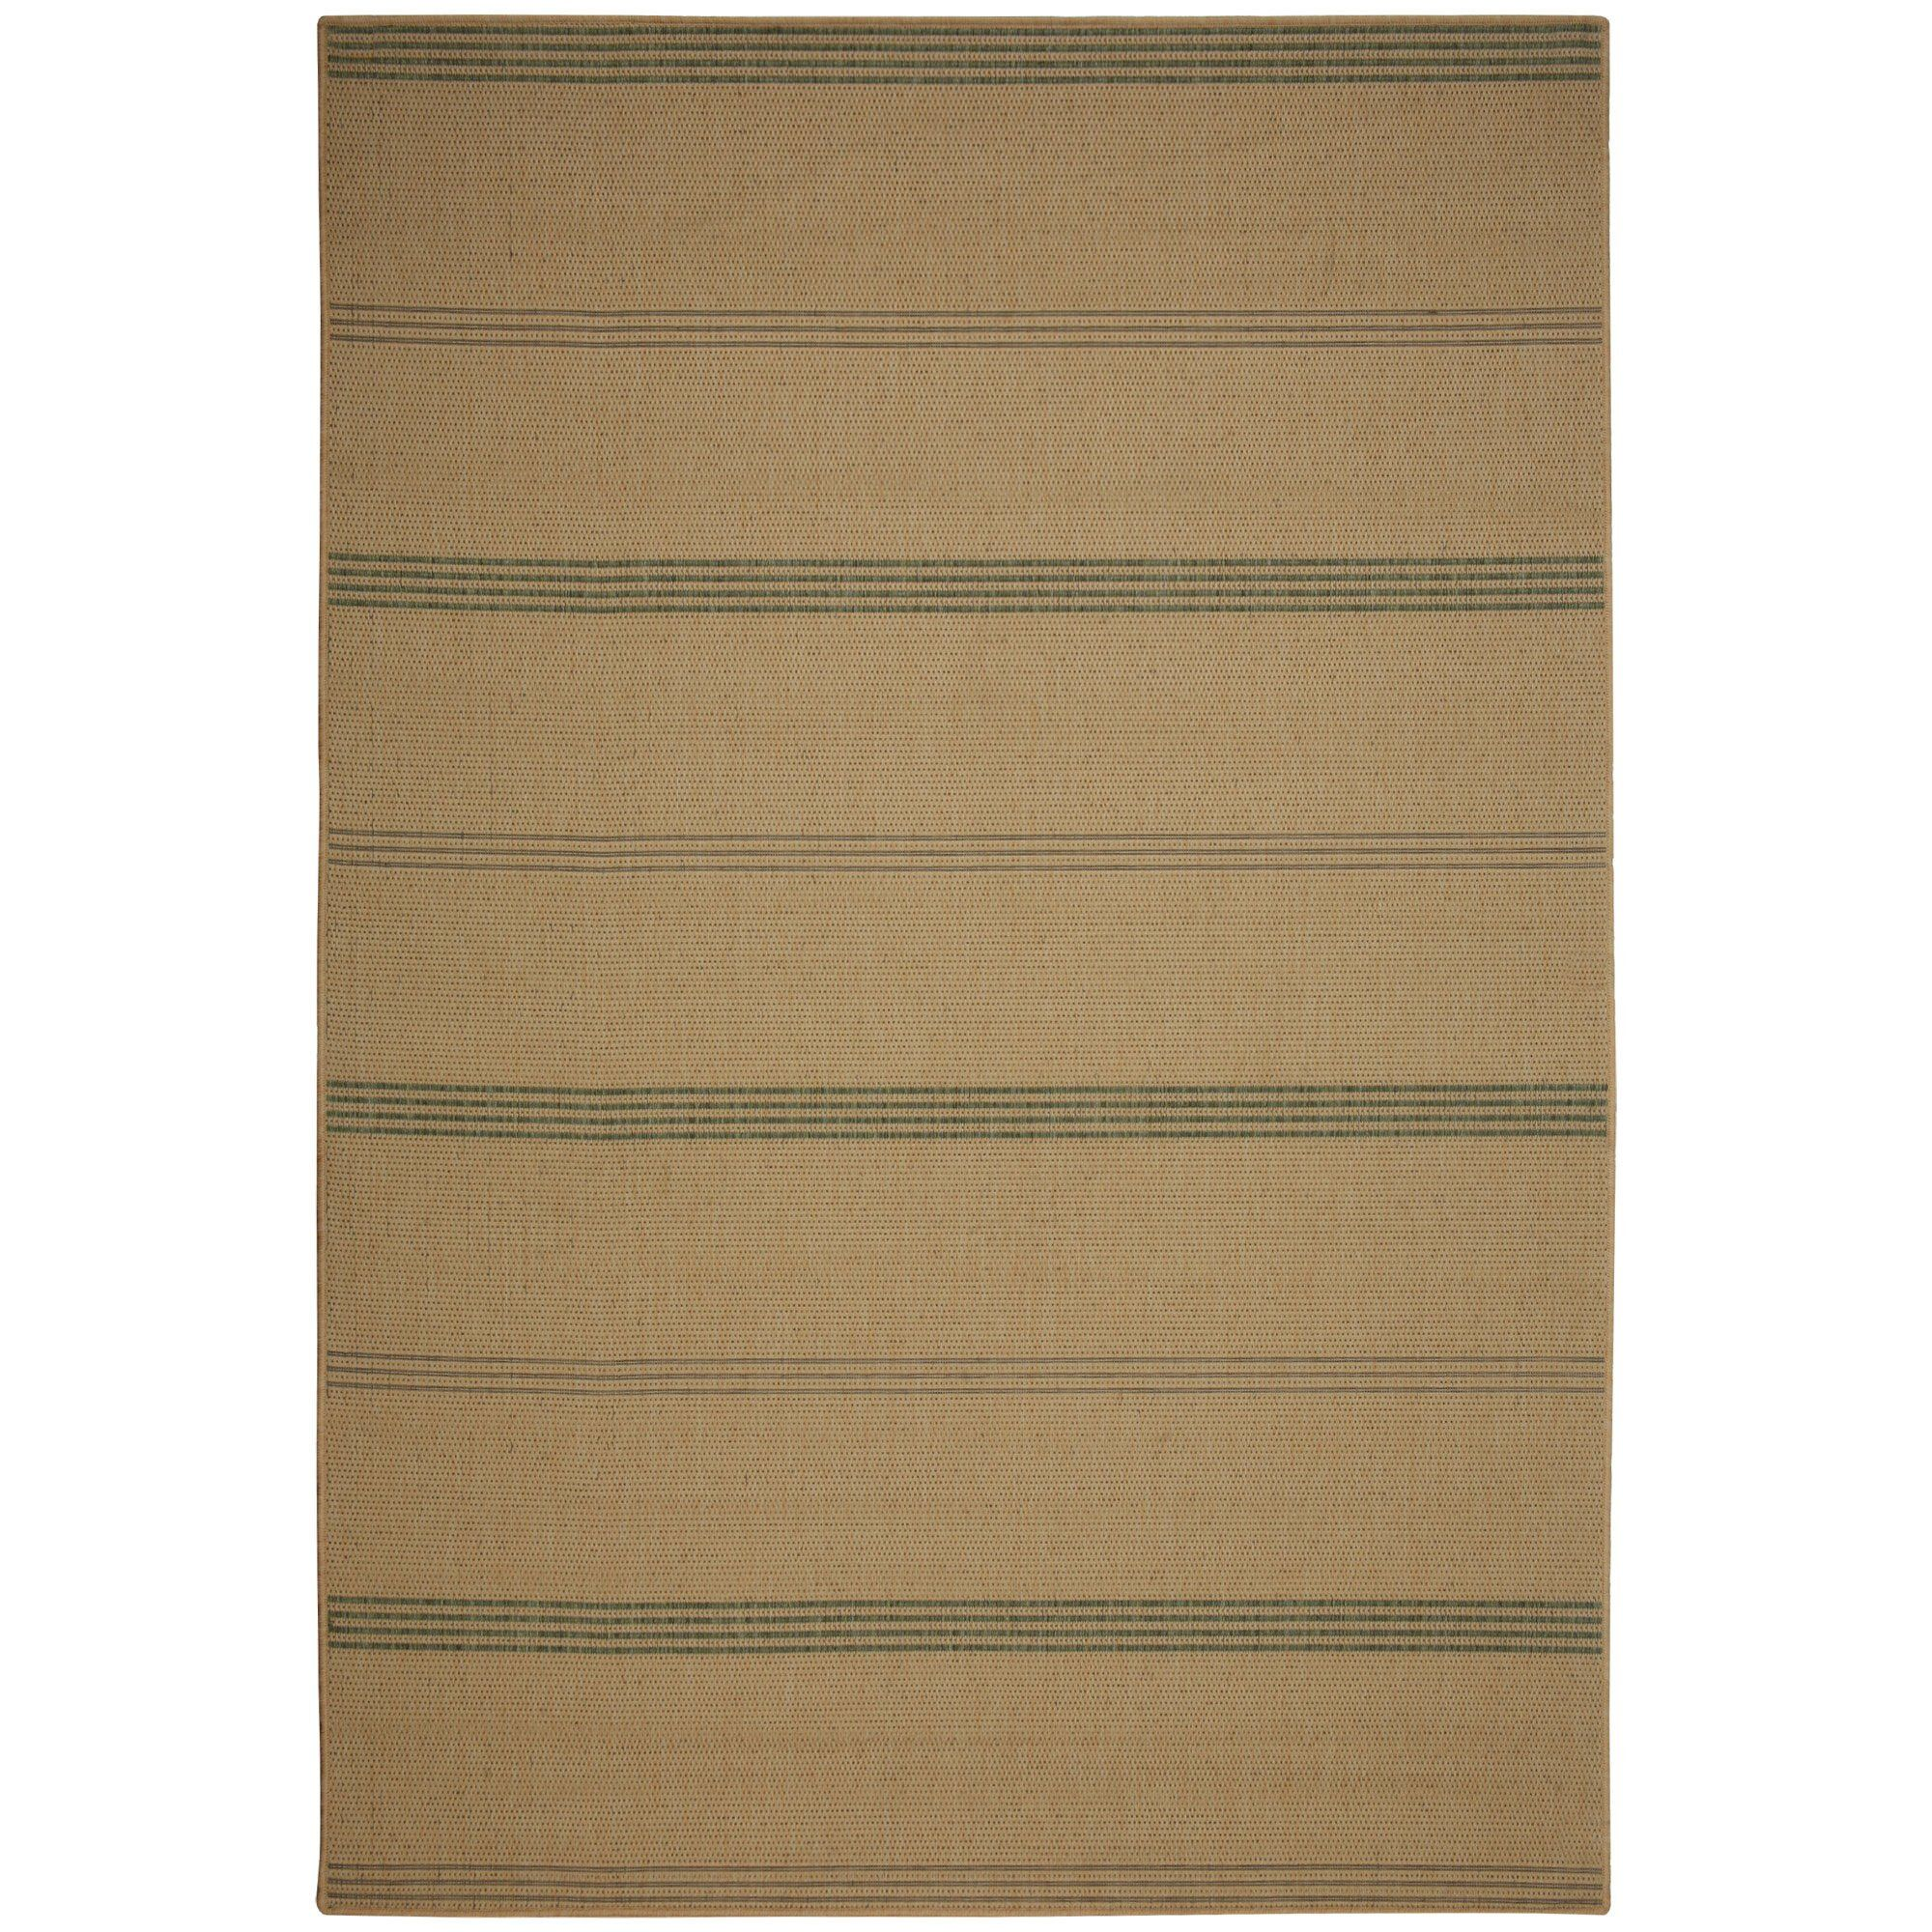 Efird Natural Stripe Indoor/Outdoor Area Rug Rug Size: Rectangle 5' x 7'